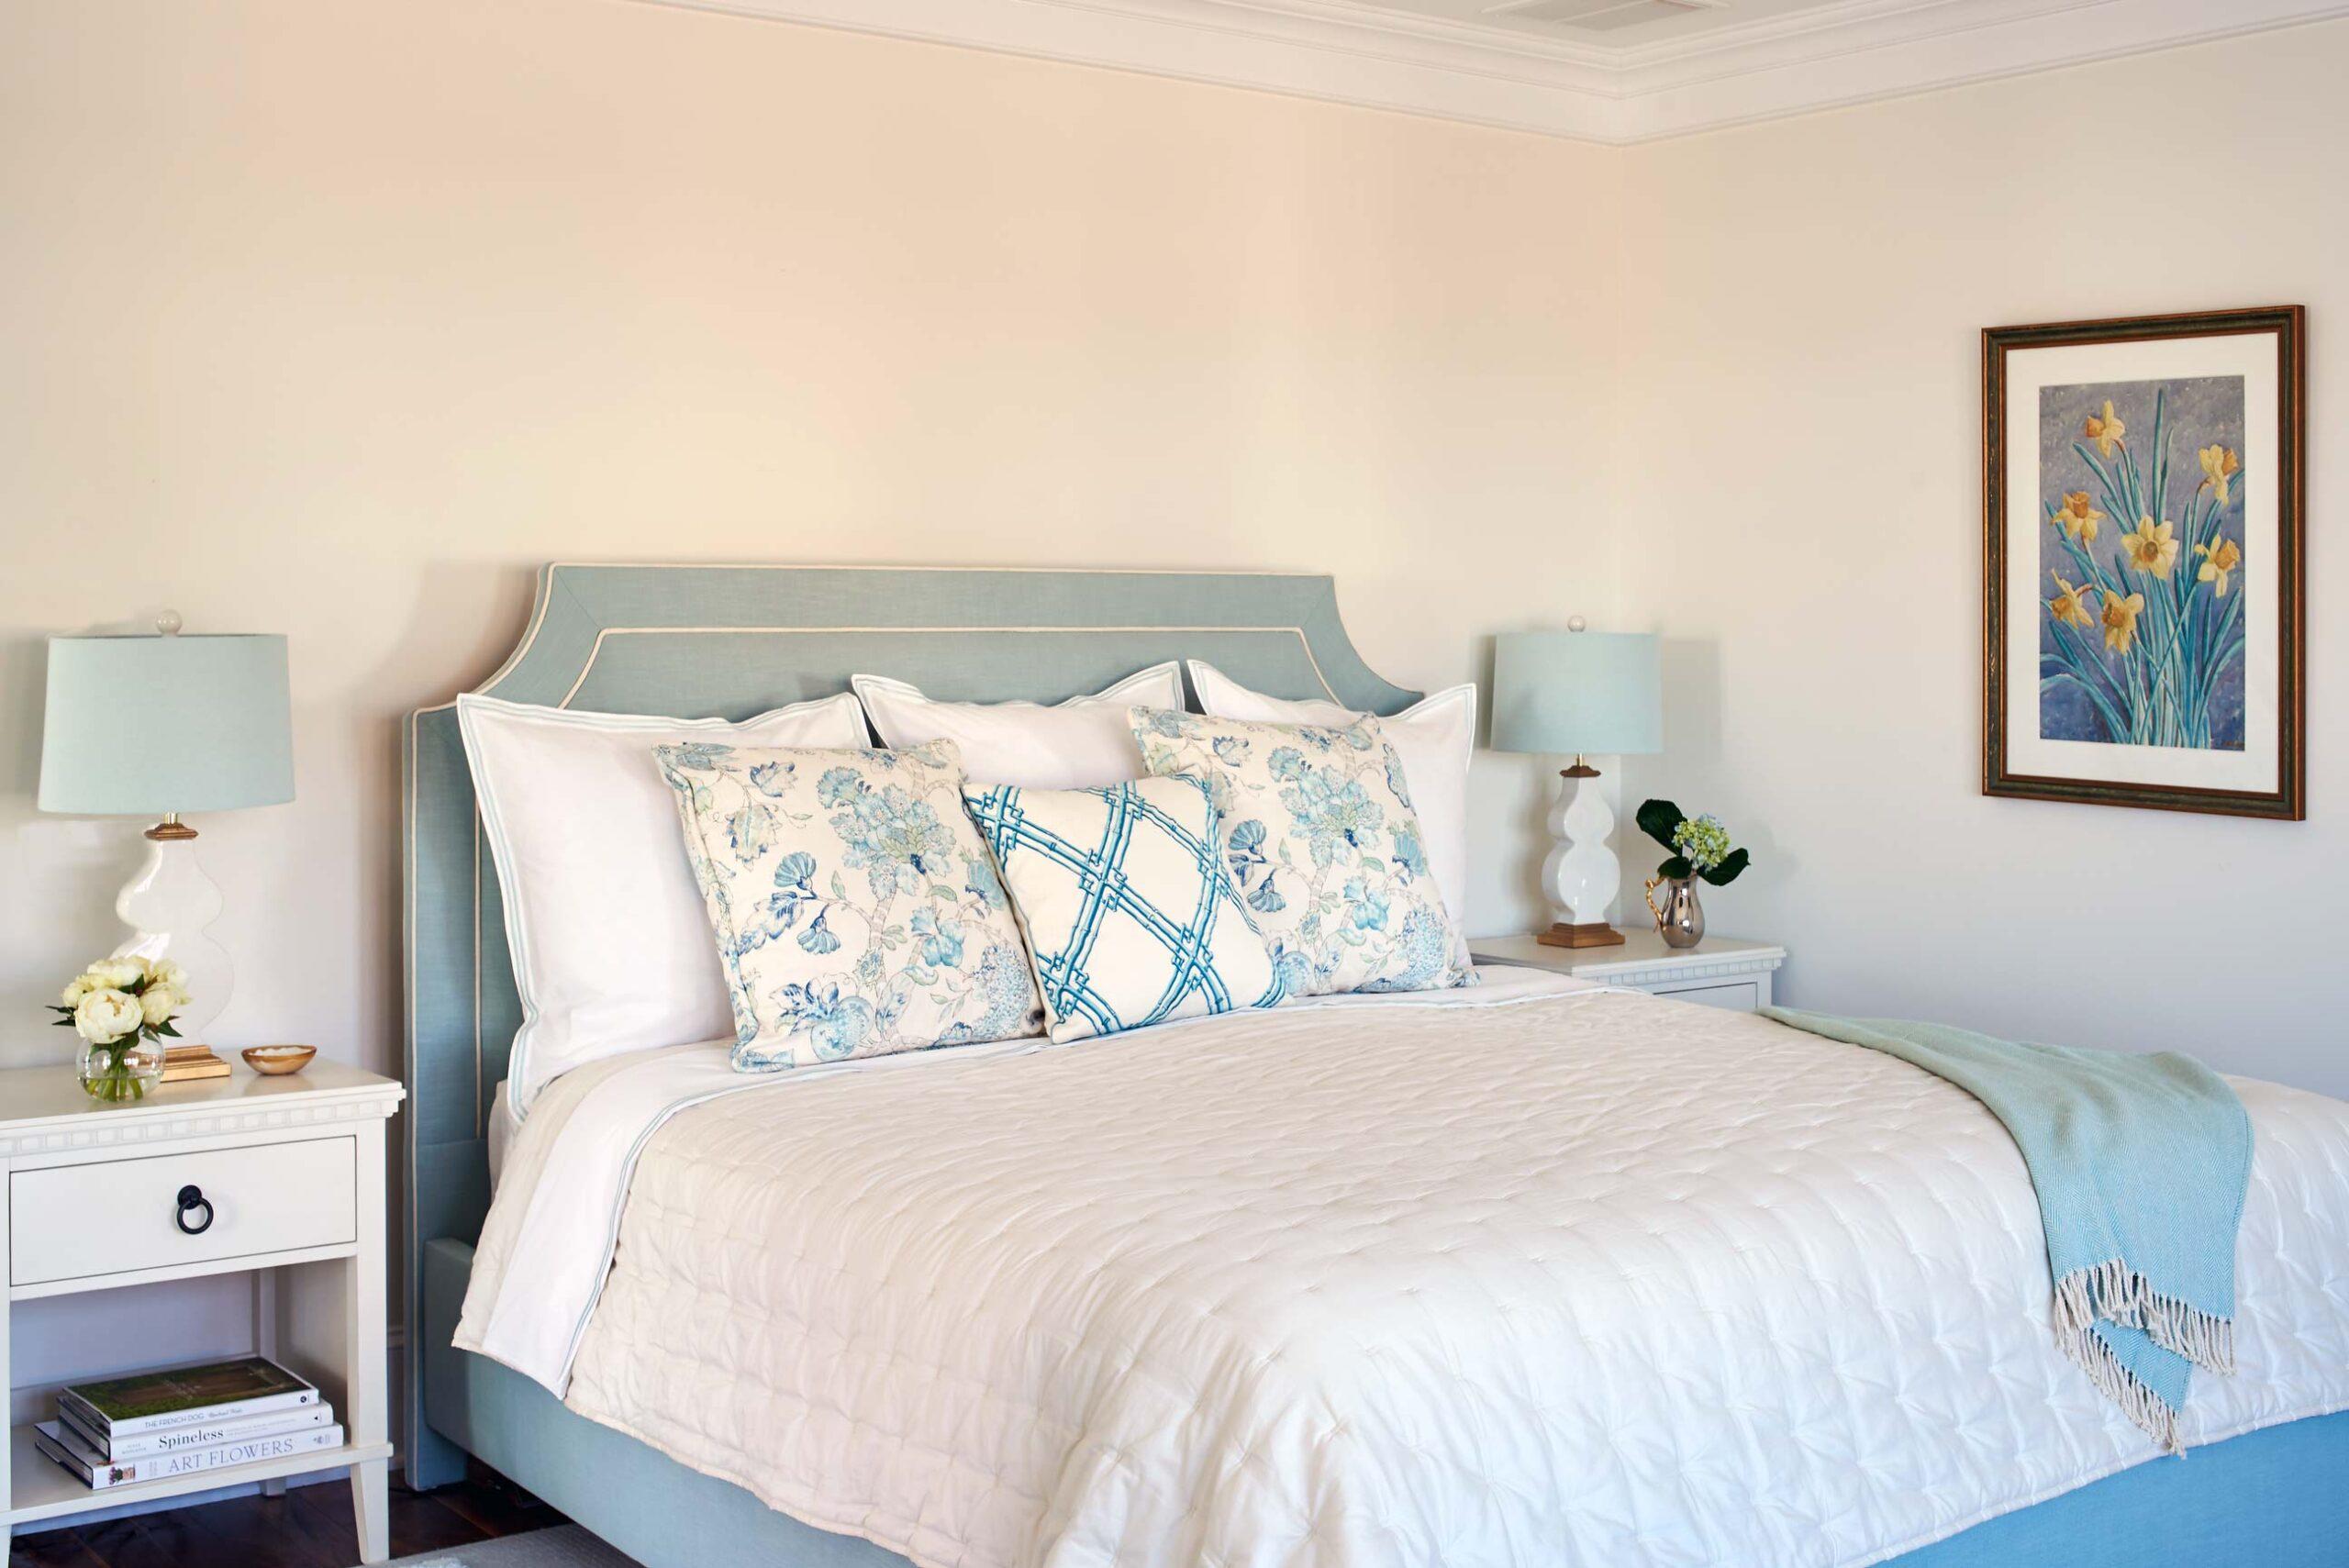 Master bedroom beach house Mantoloking NJ